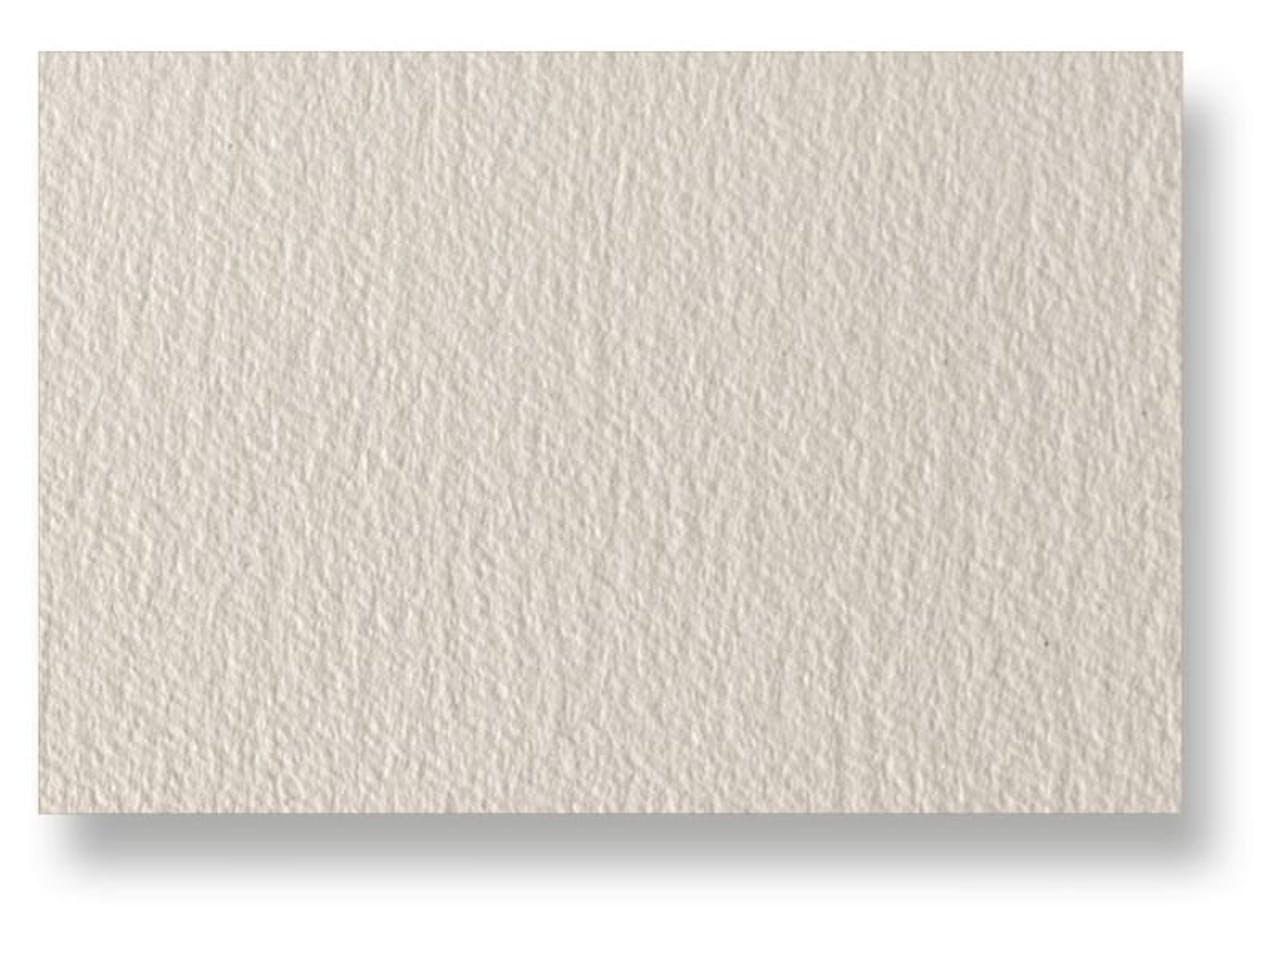 Hahnemühle Aquarellkarton Echt Bütten, 300 g/m², Bogen, ca. 500 x 650 mm (SB), matt